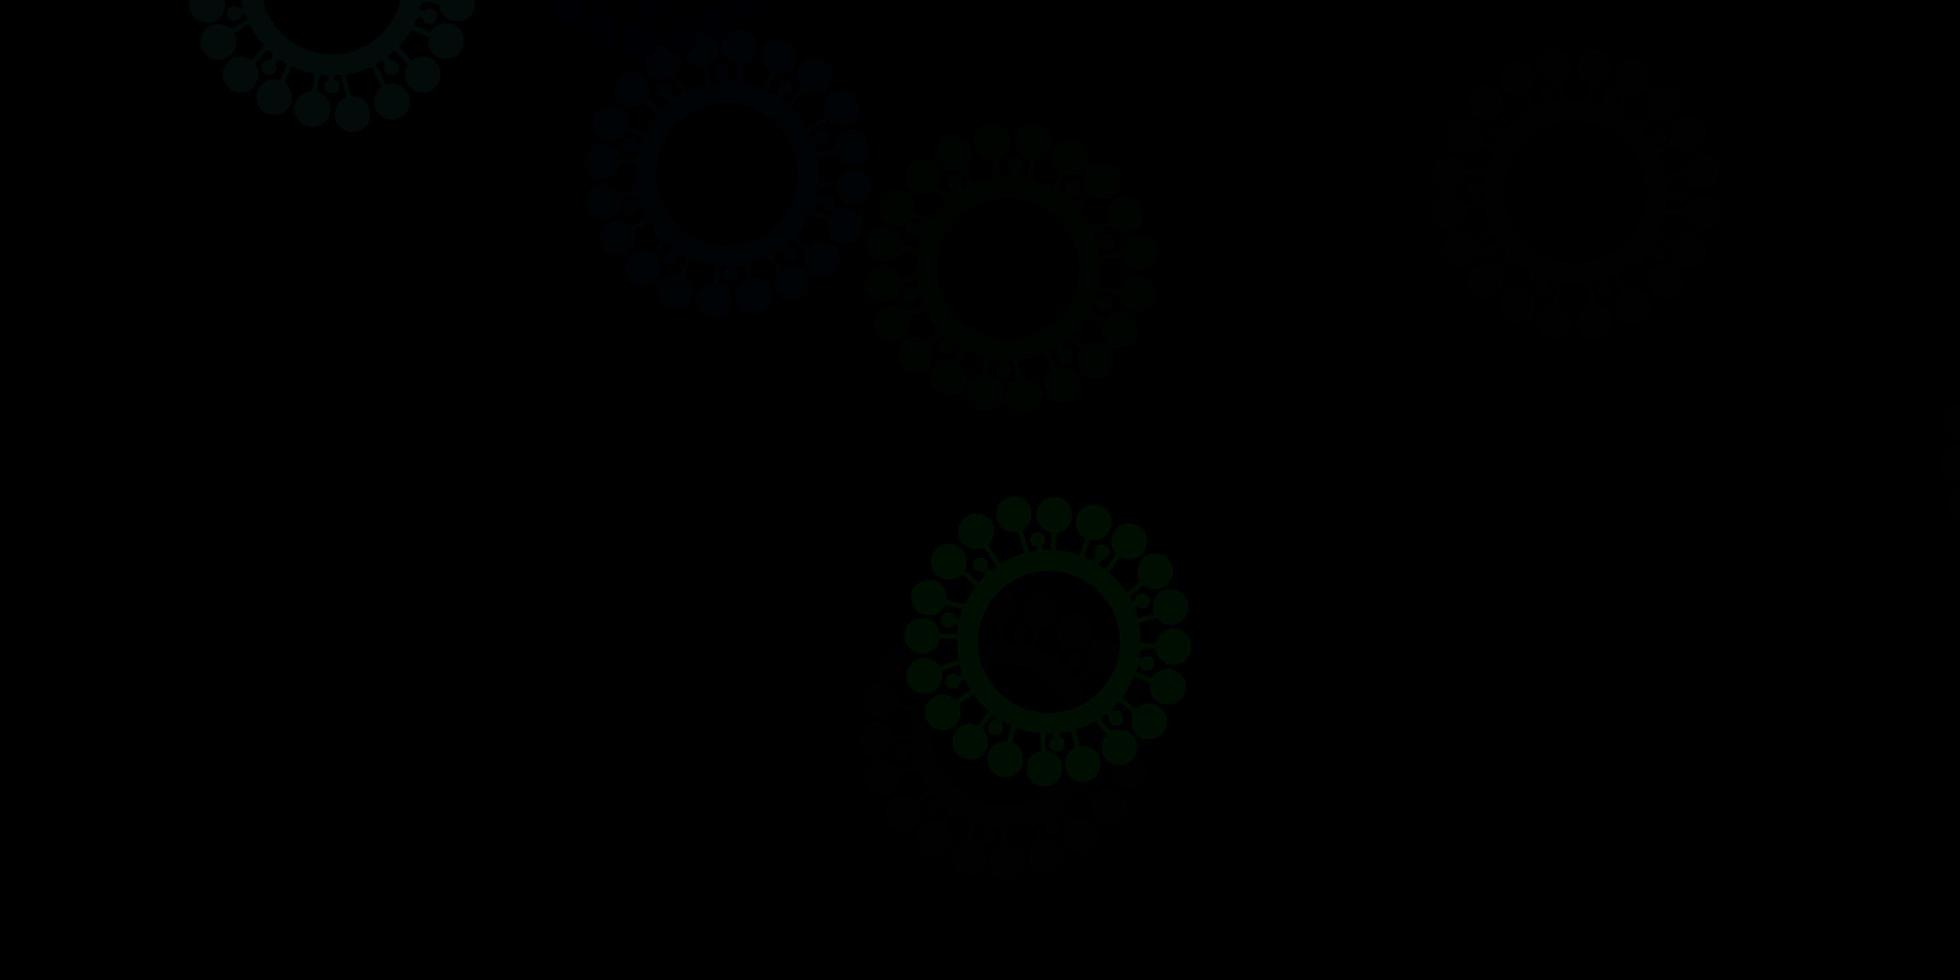 plantilla de vector verde oscuro con signos de gripe.